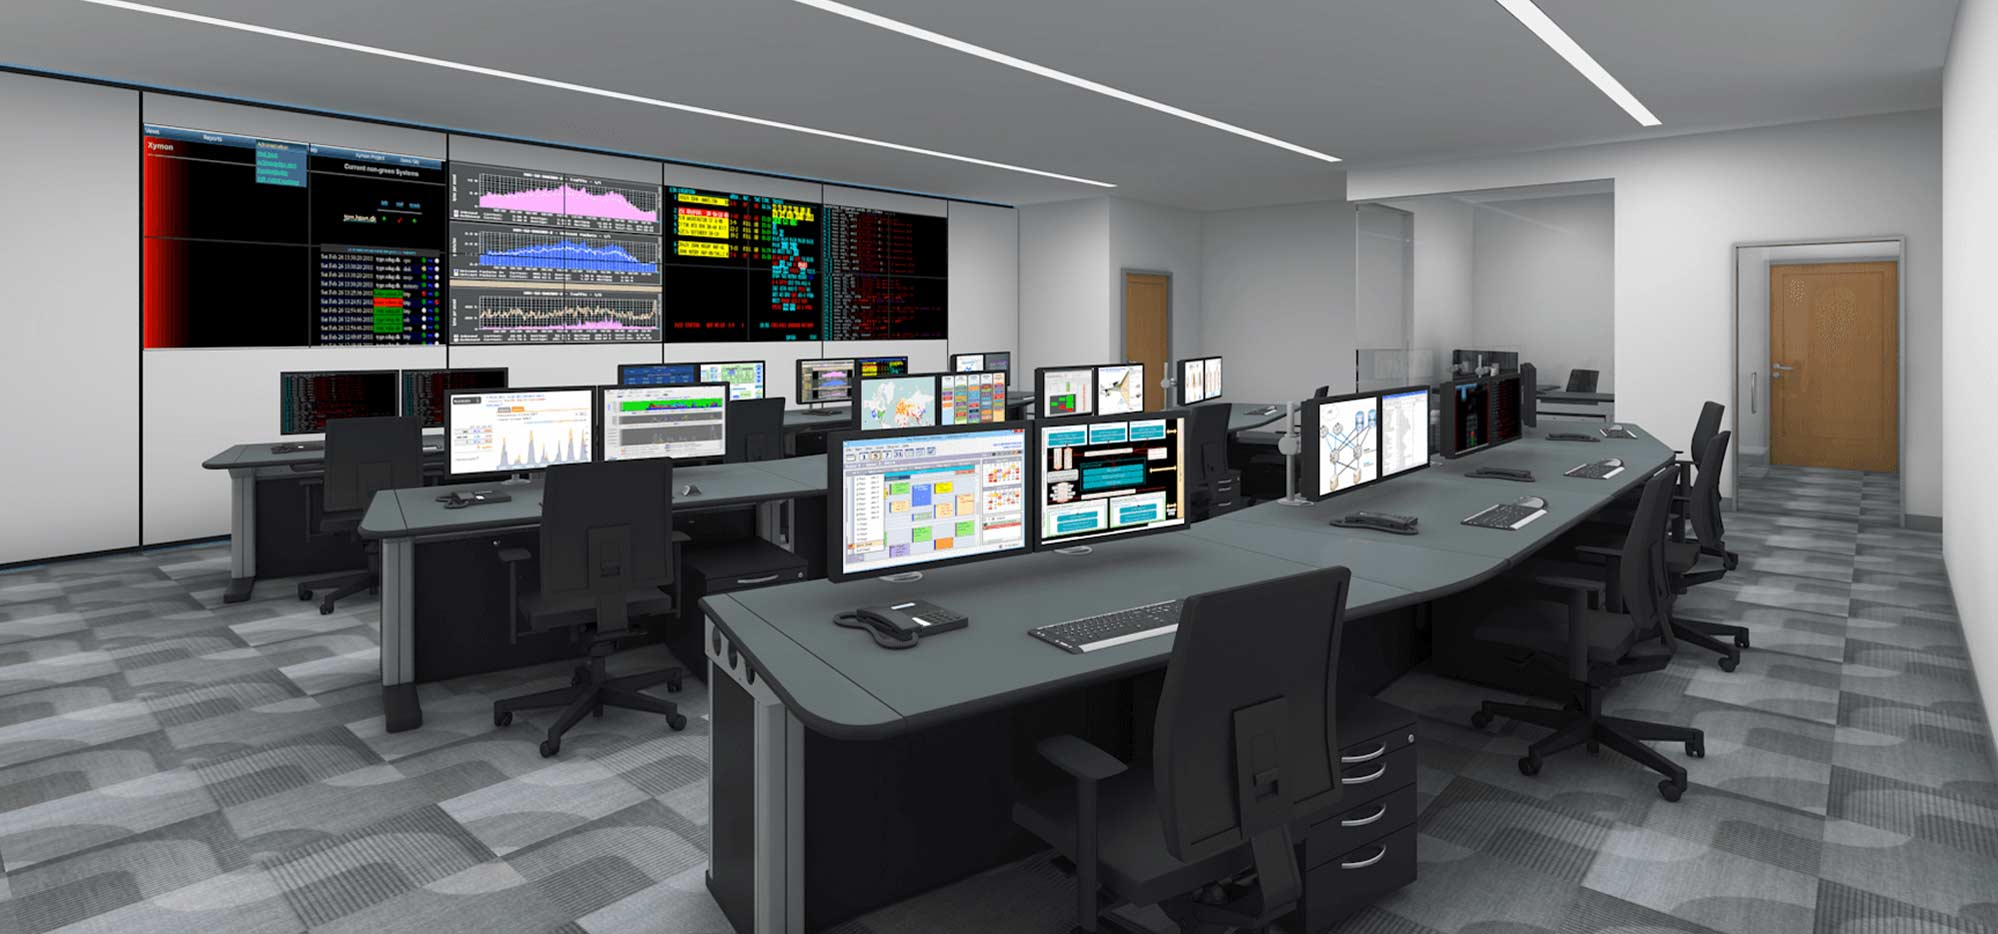 HDBaseT Matrix Switcher 1